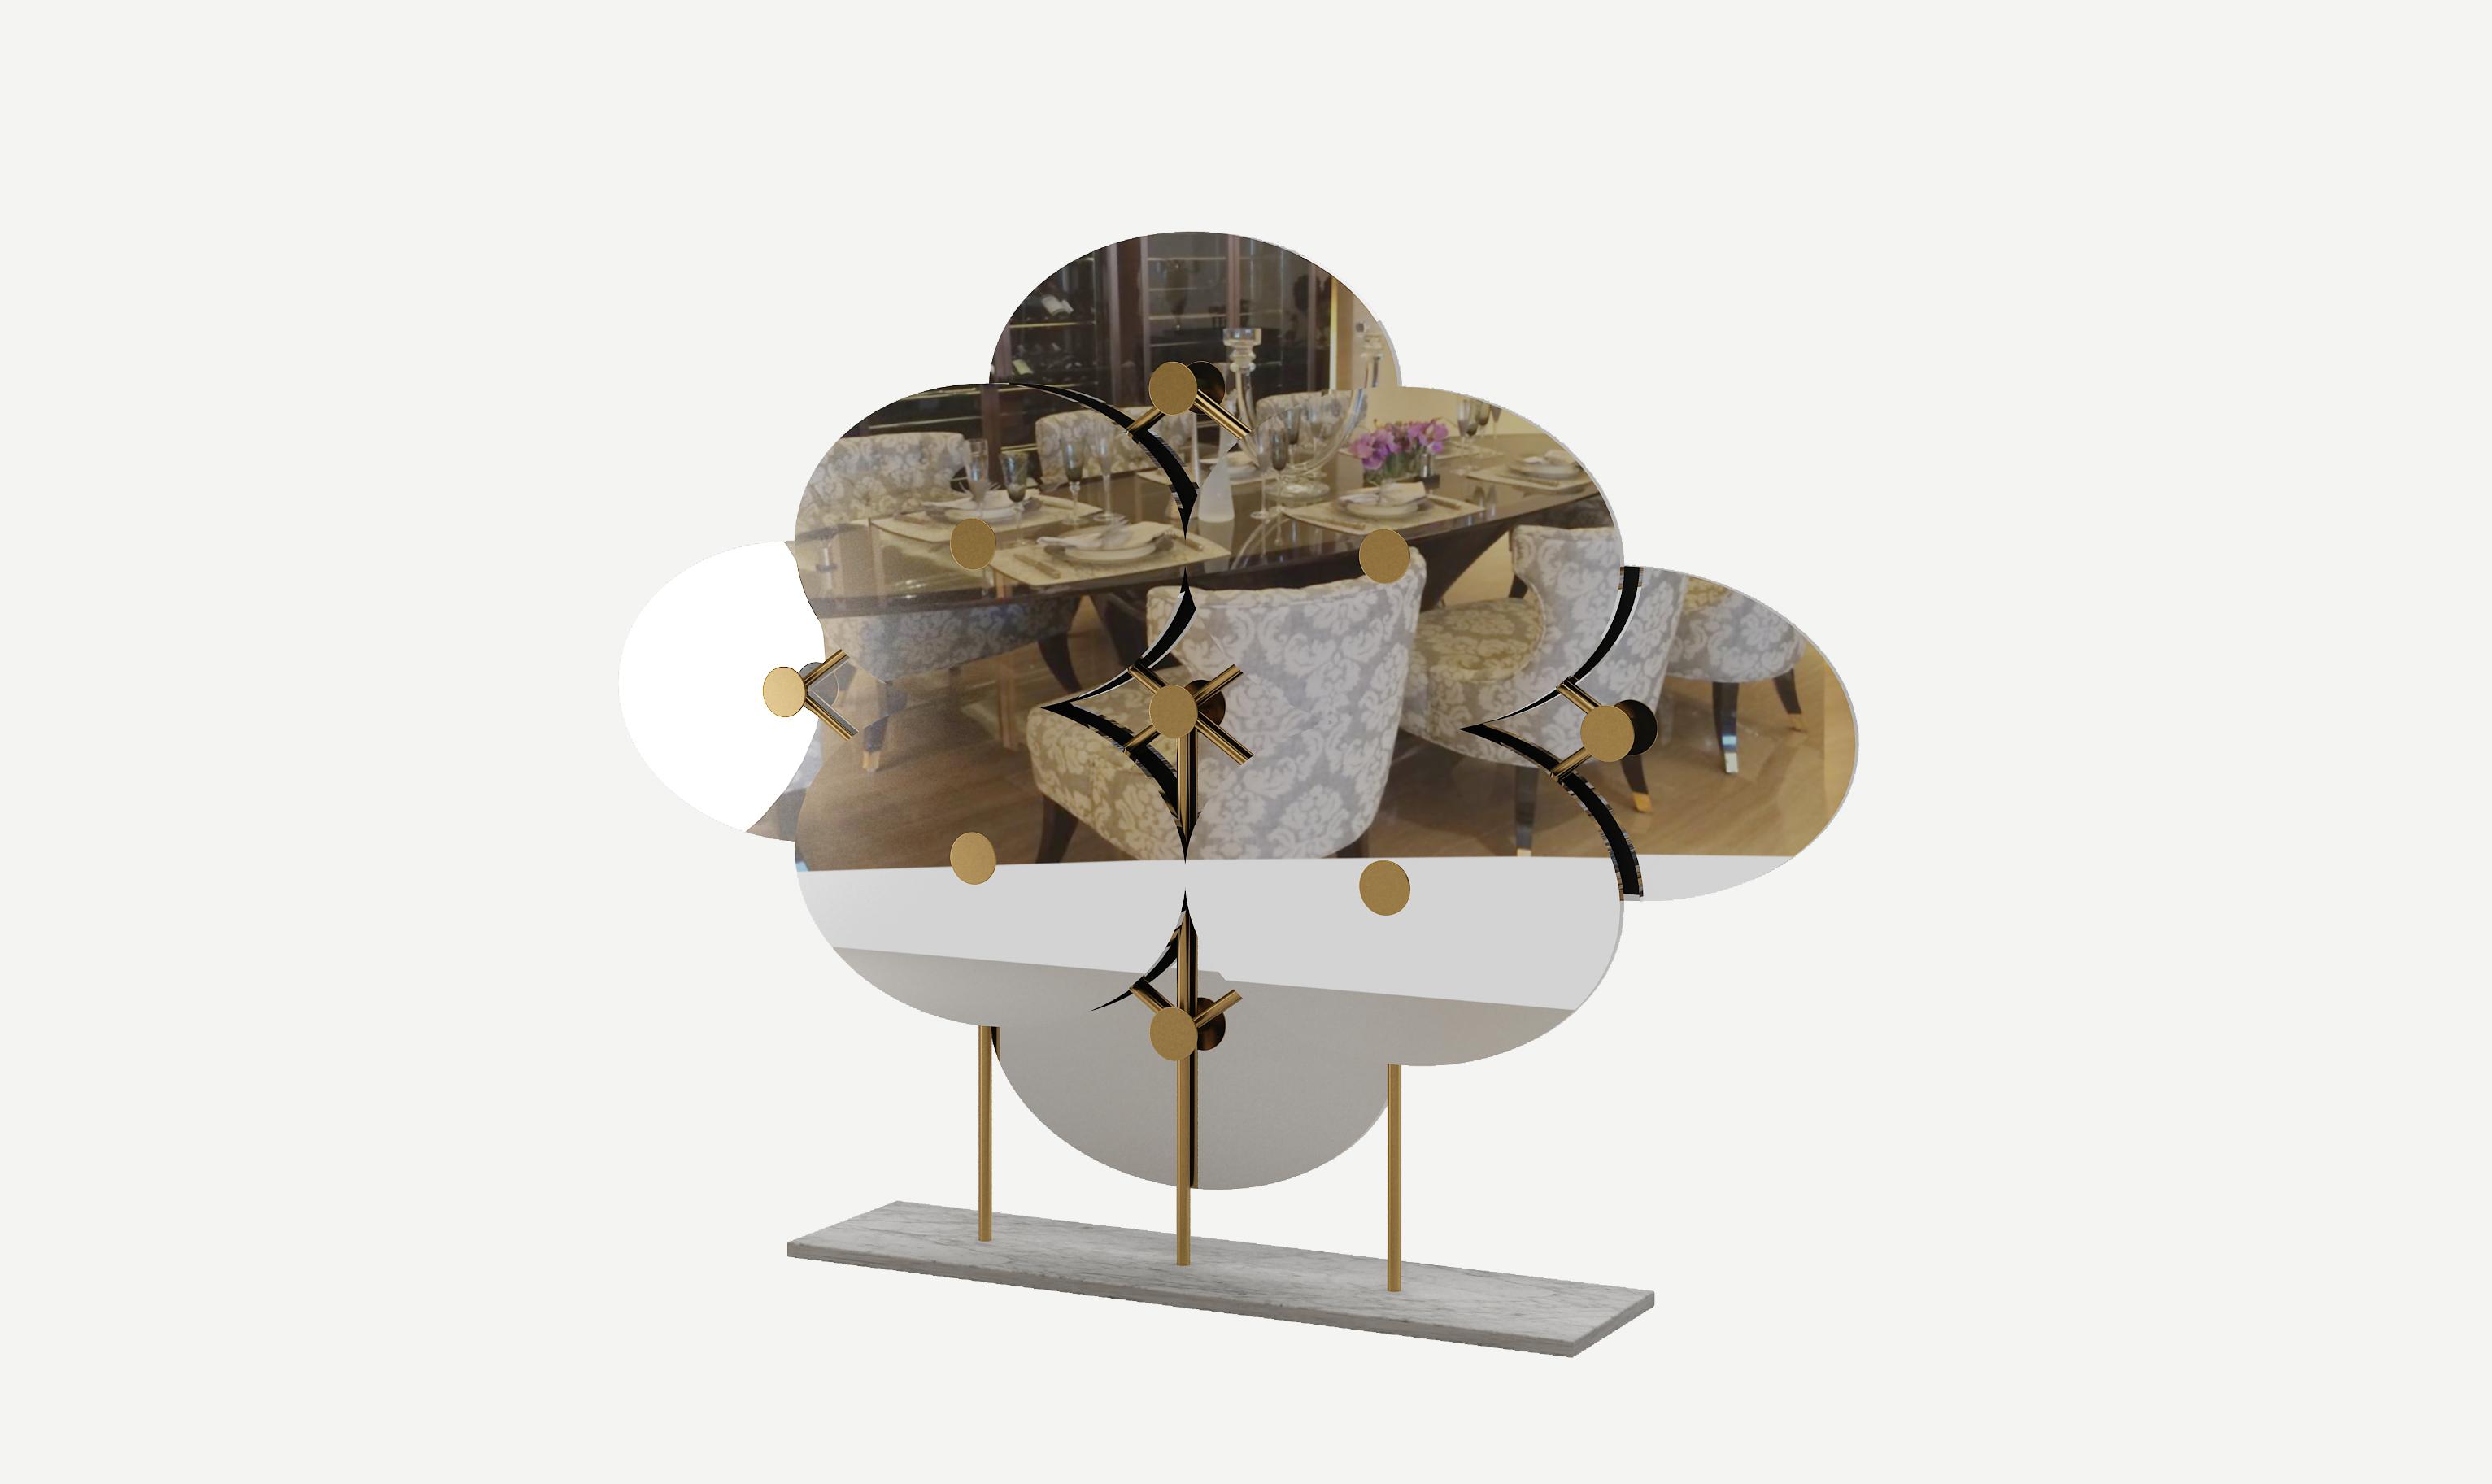 DesignMVW_XuMing&VirginieMoriette_YunMirror_collectiblesHall